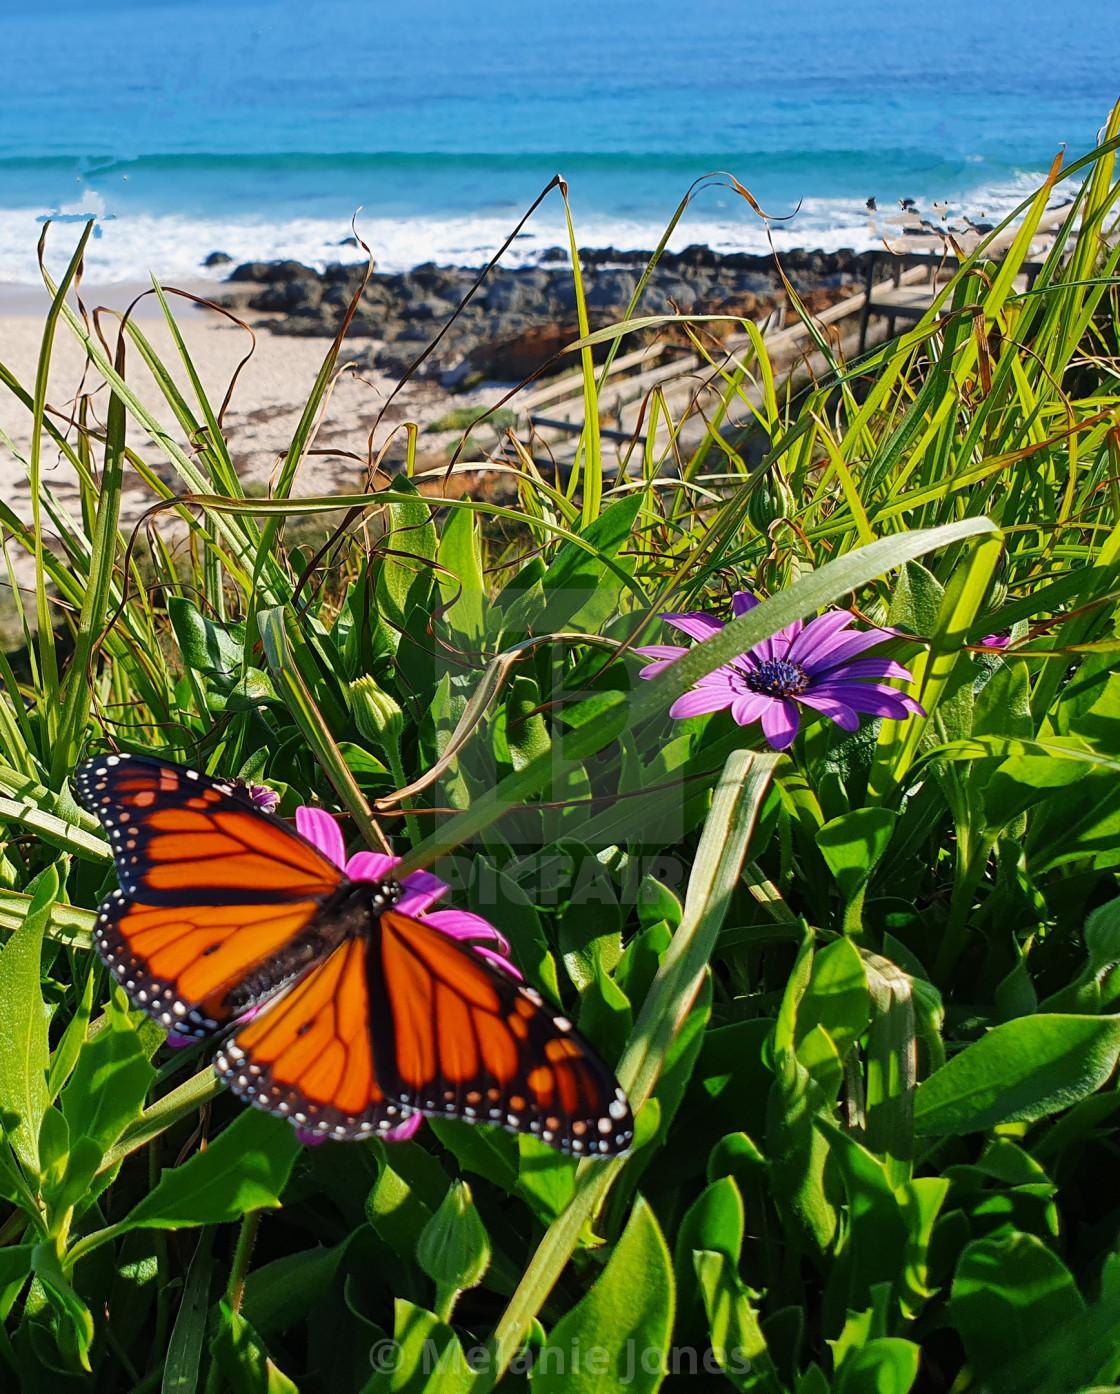 """Monarch Butterfly at Carrickalinga beach"" stock image"